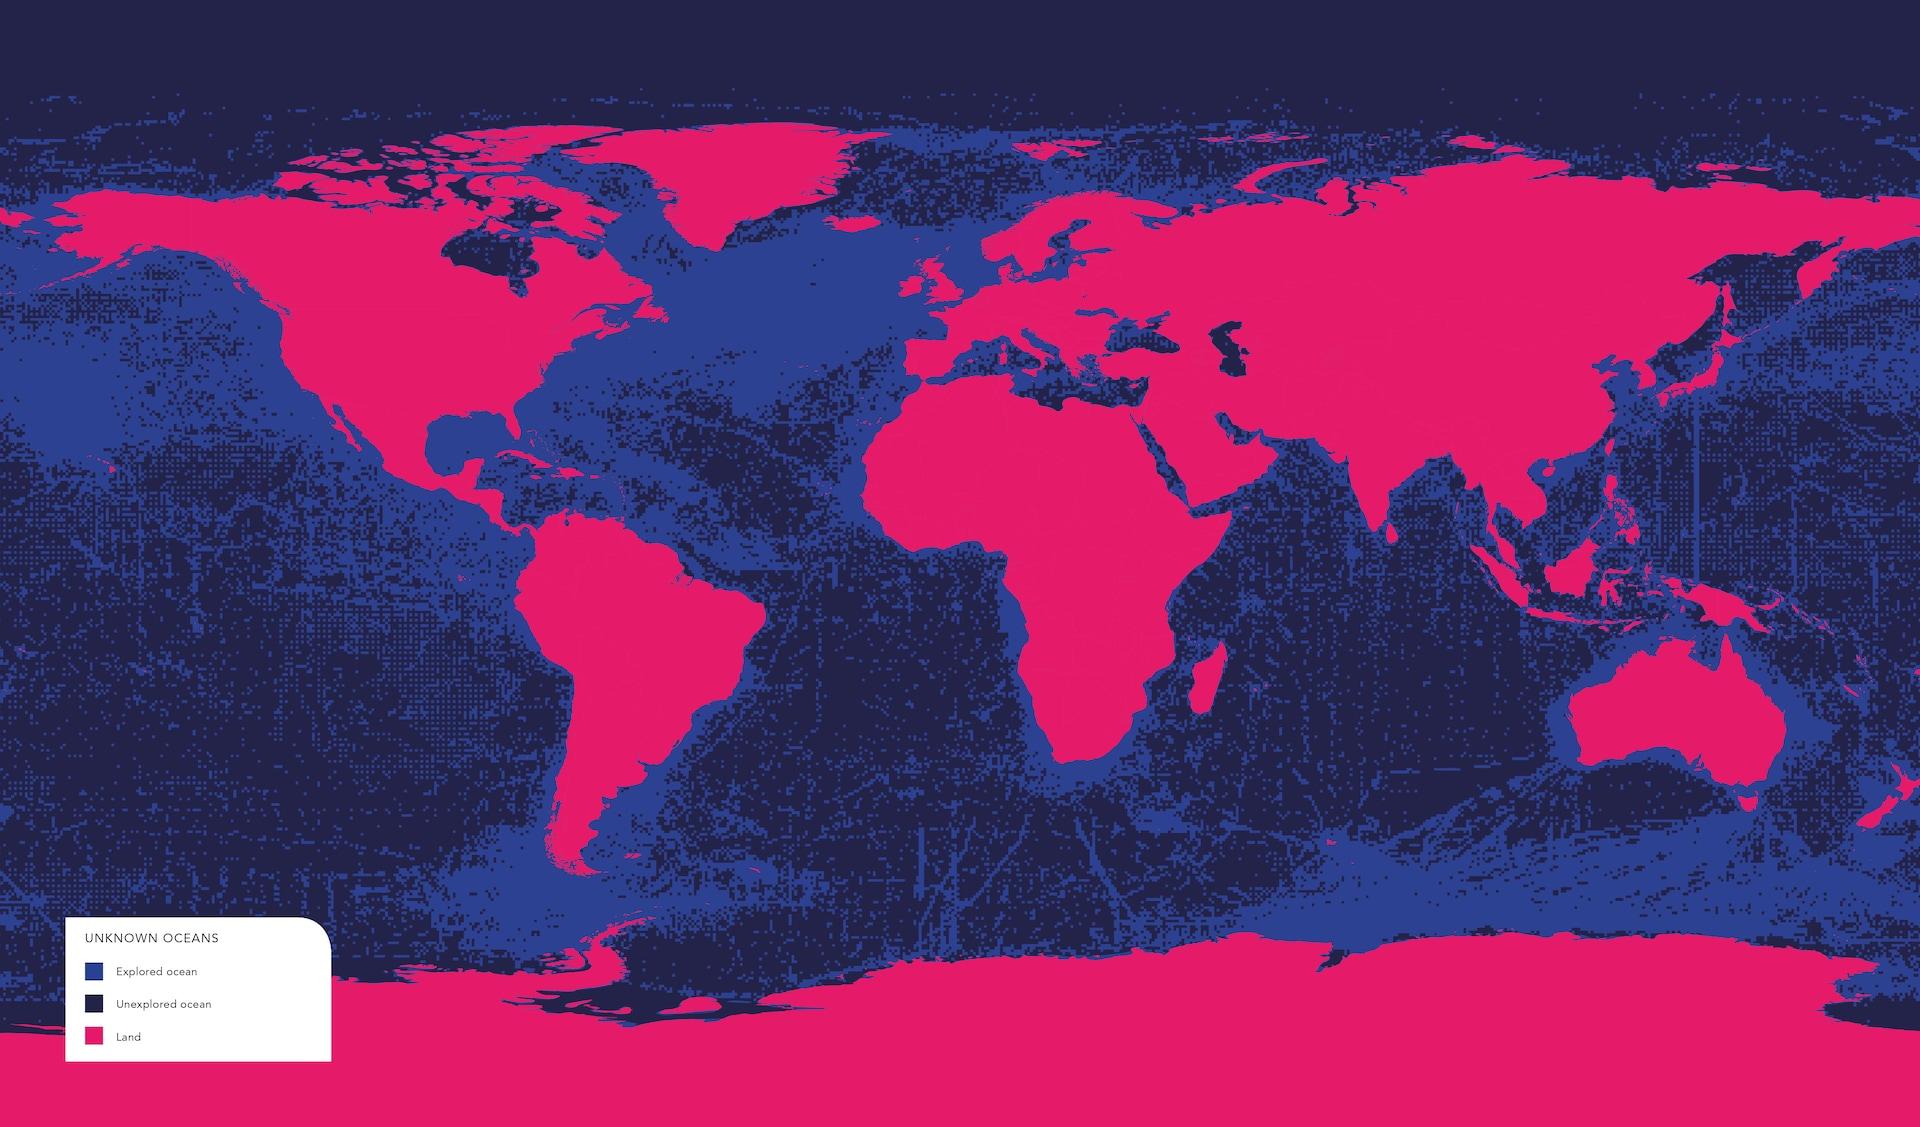 The oceans data deficit.